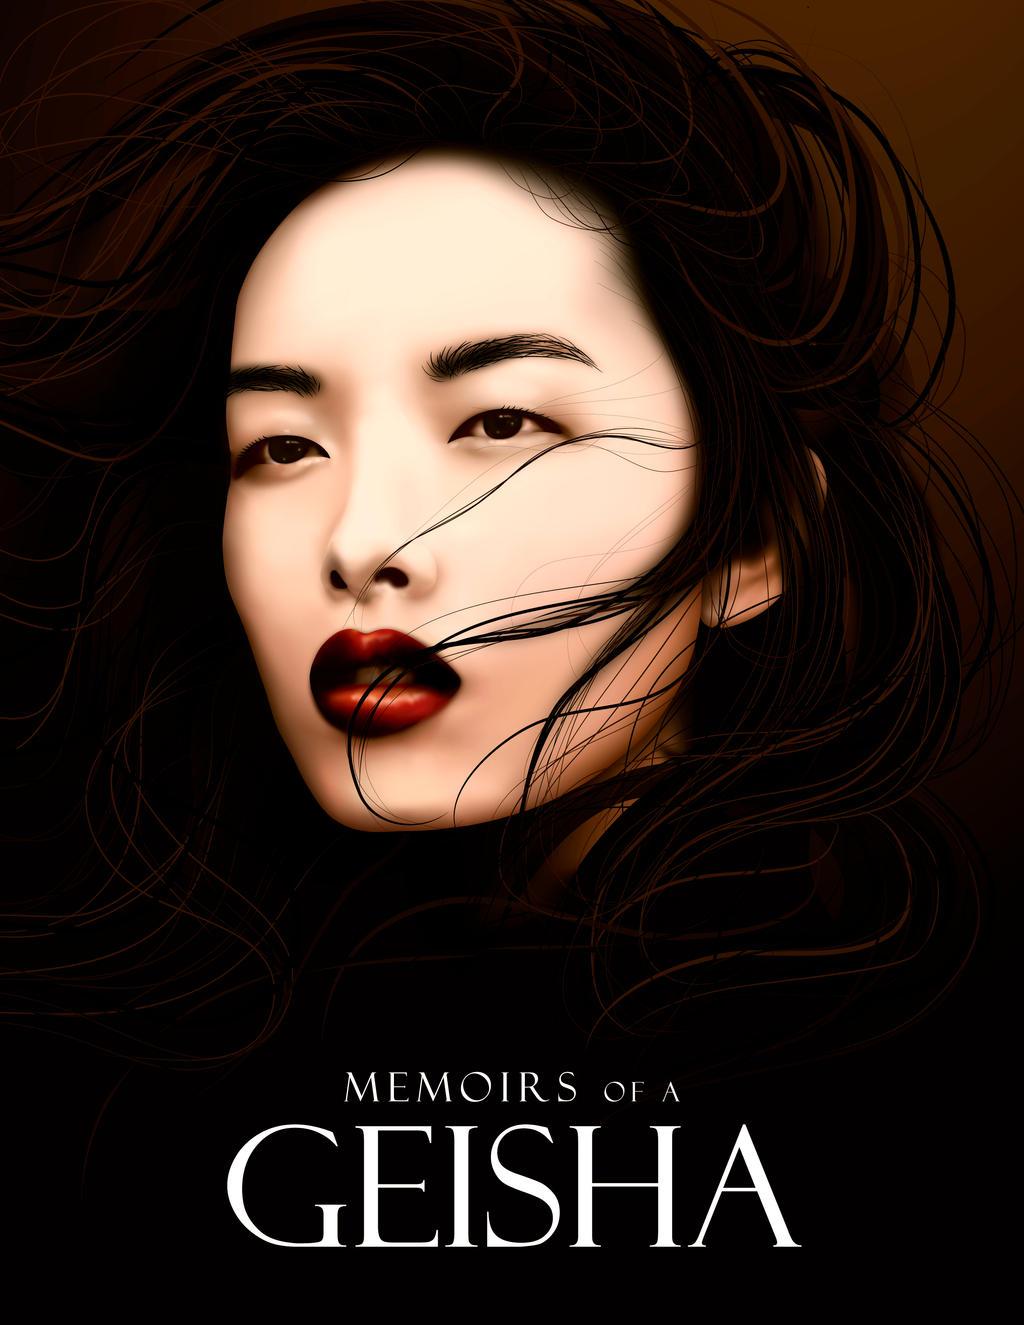 Vectorial Geisha by Man9u